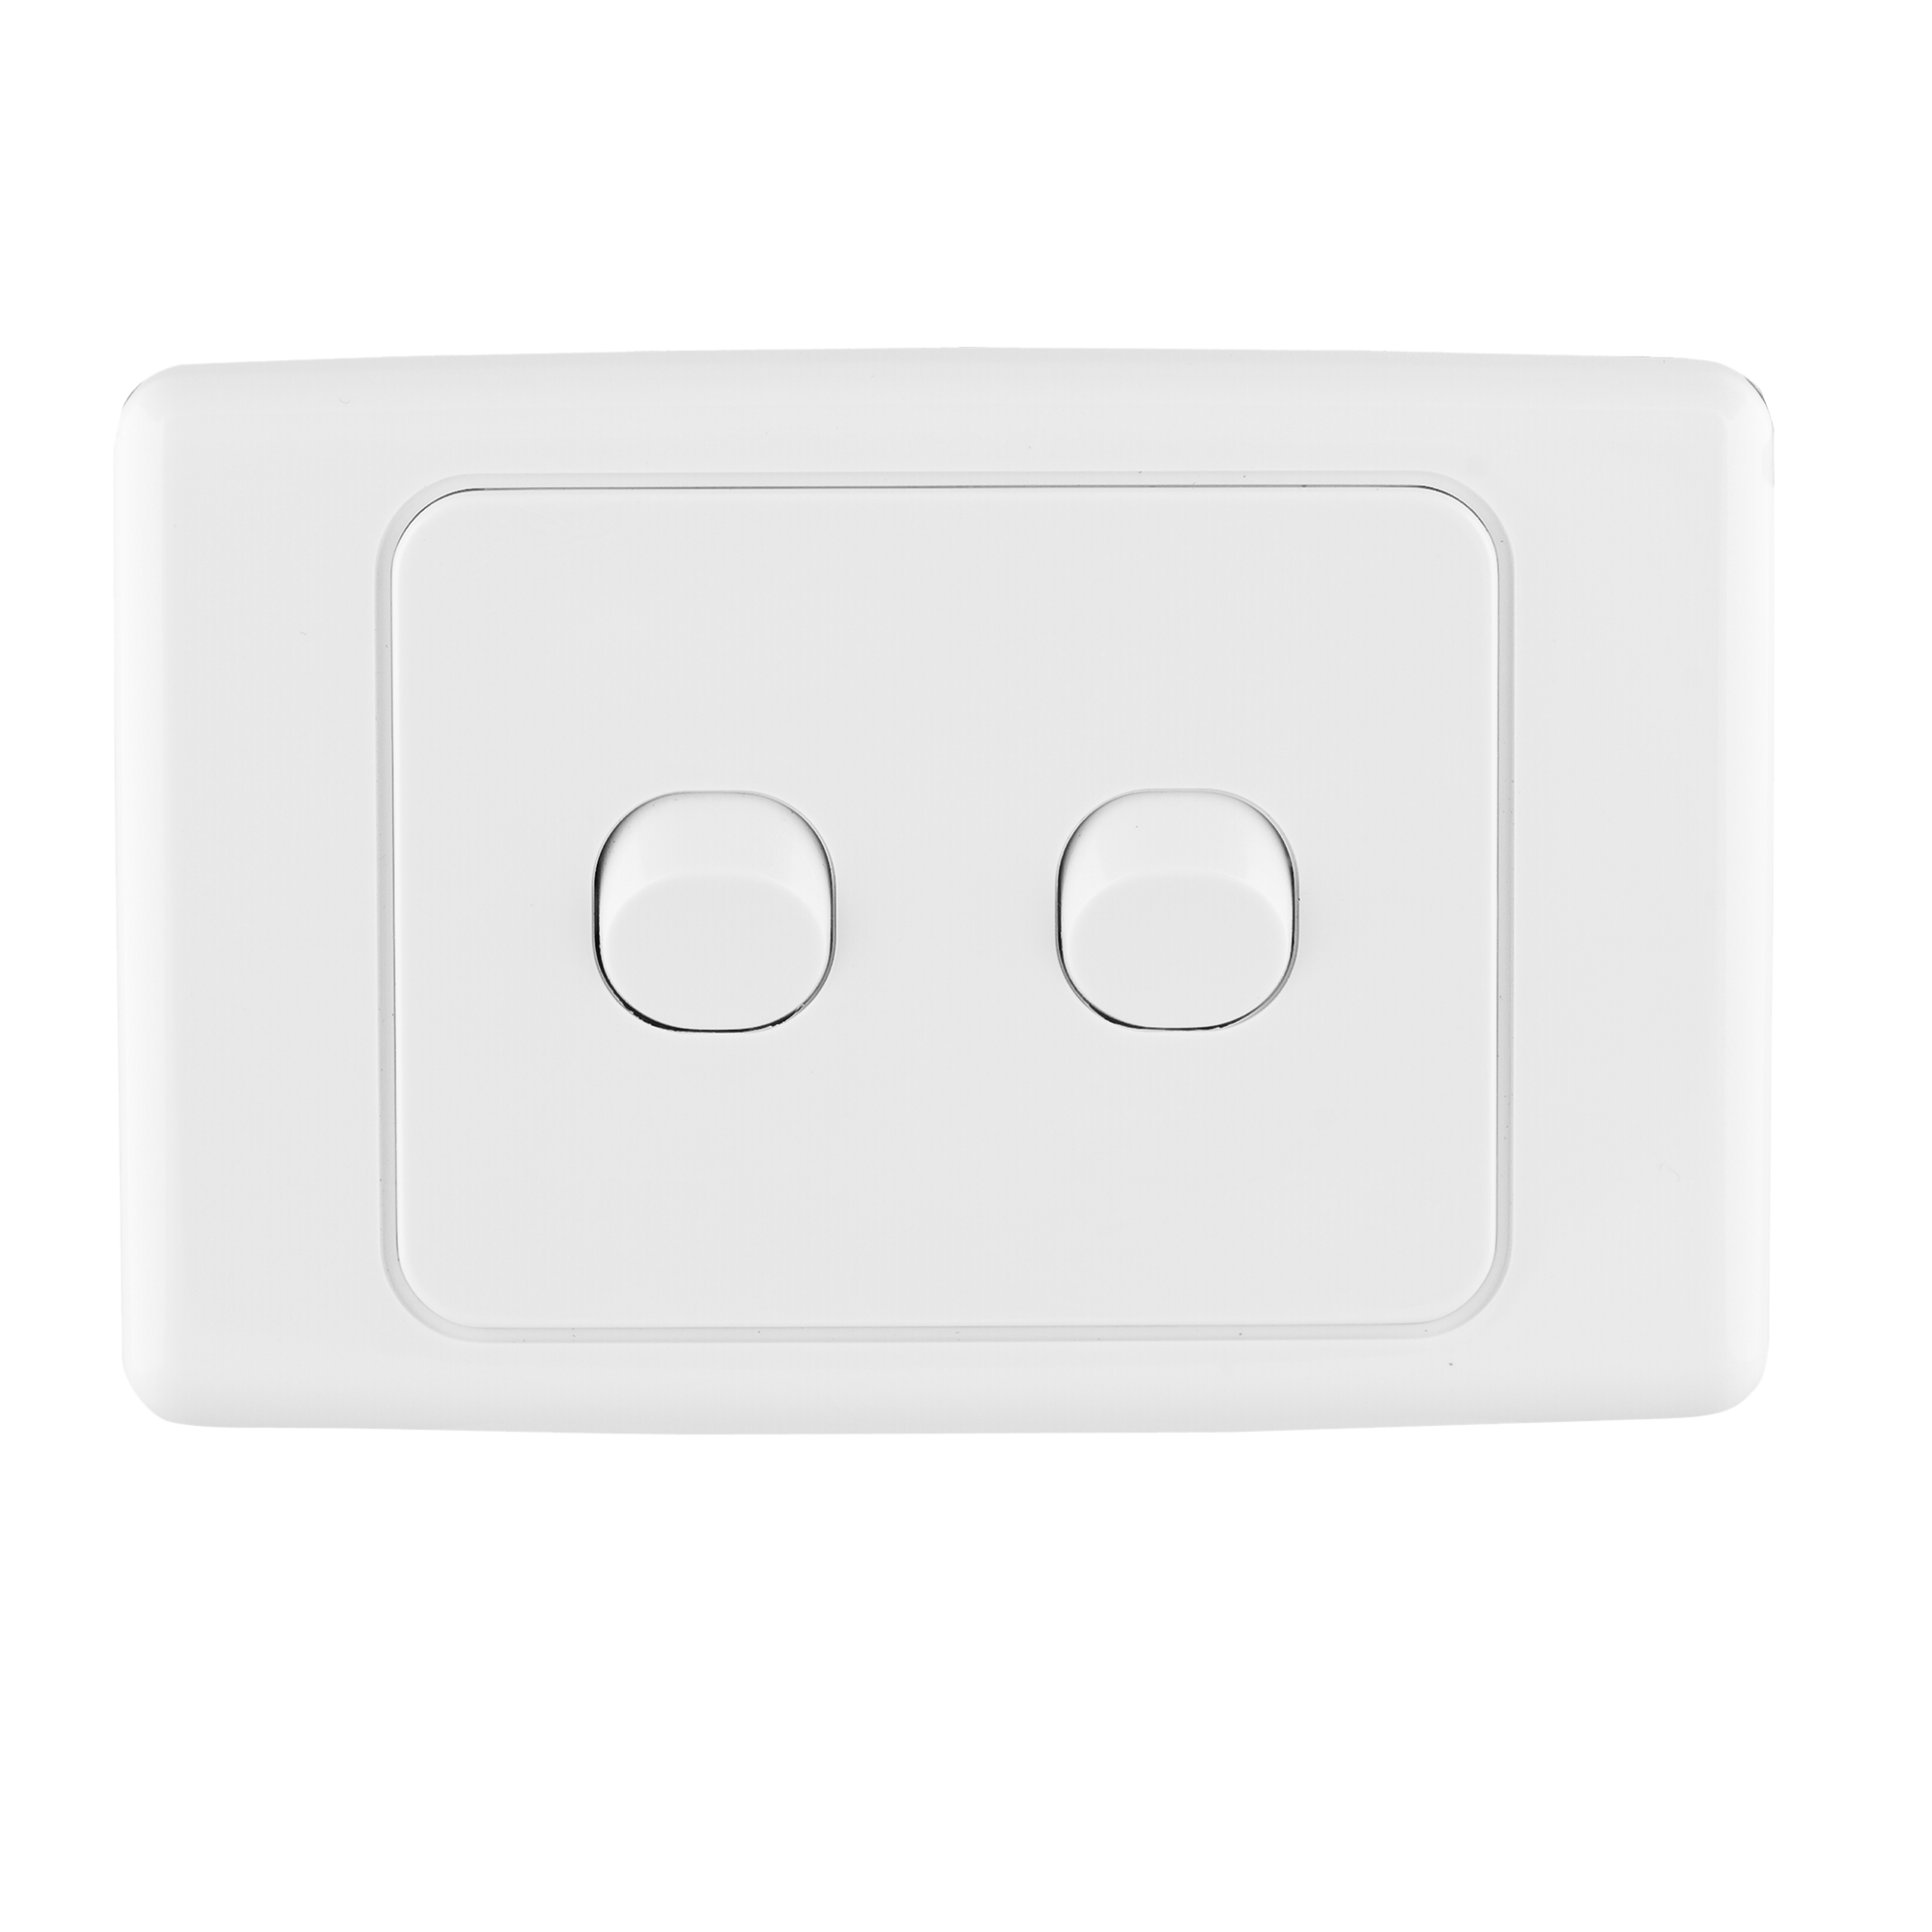 Deta double switch